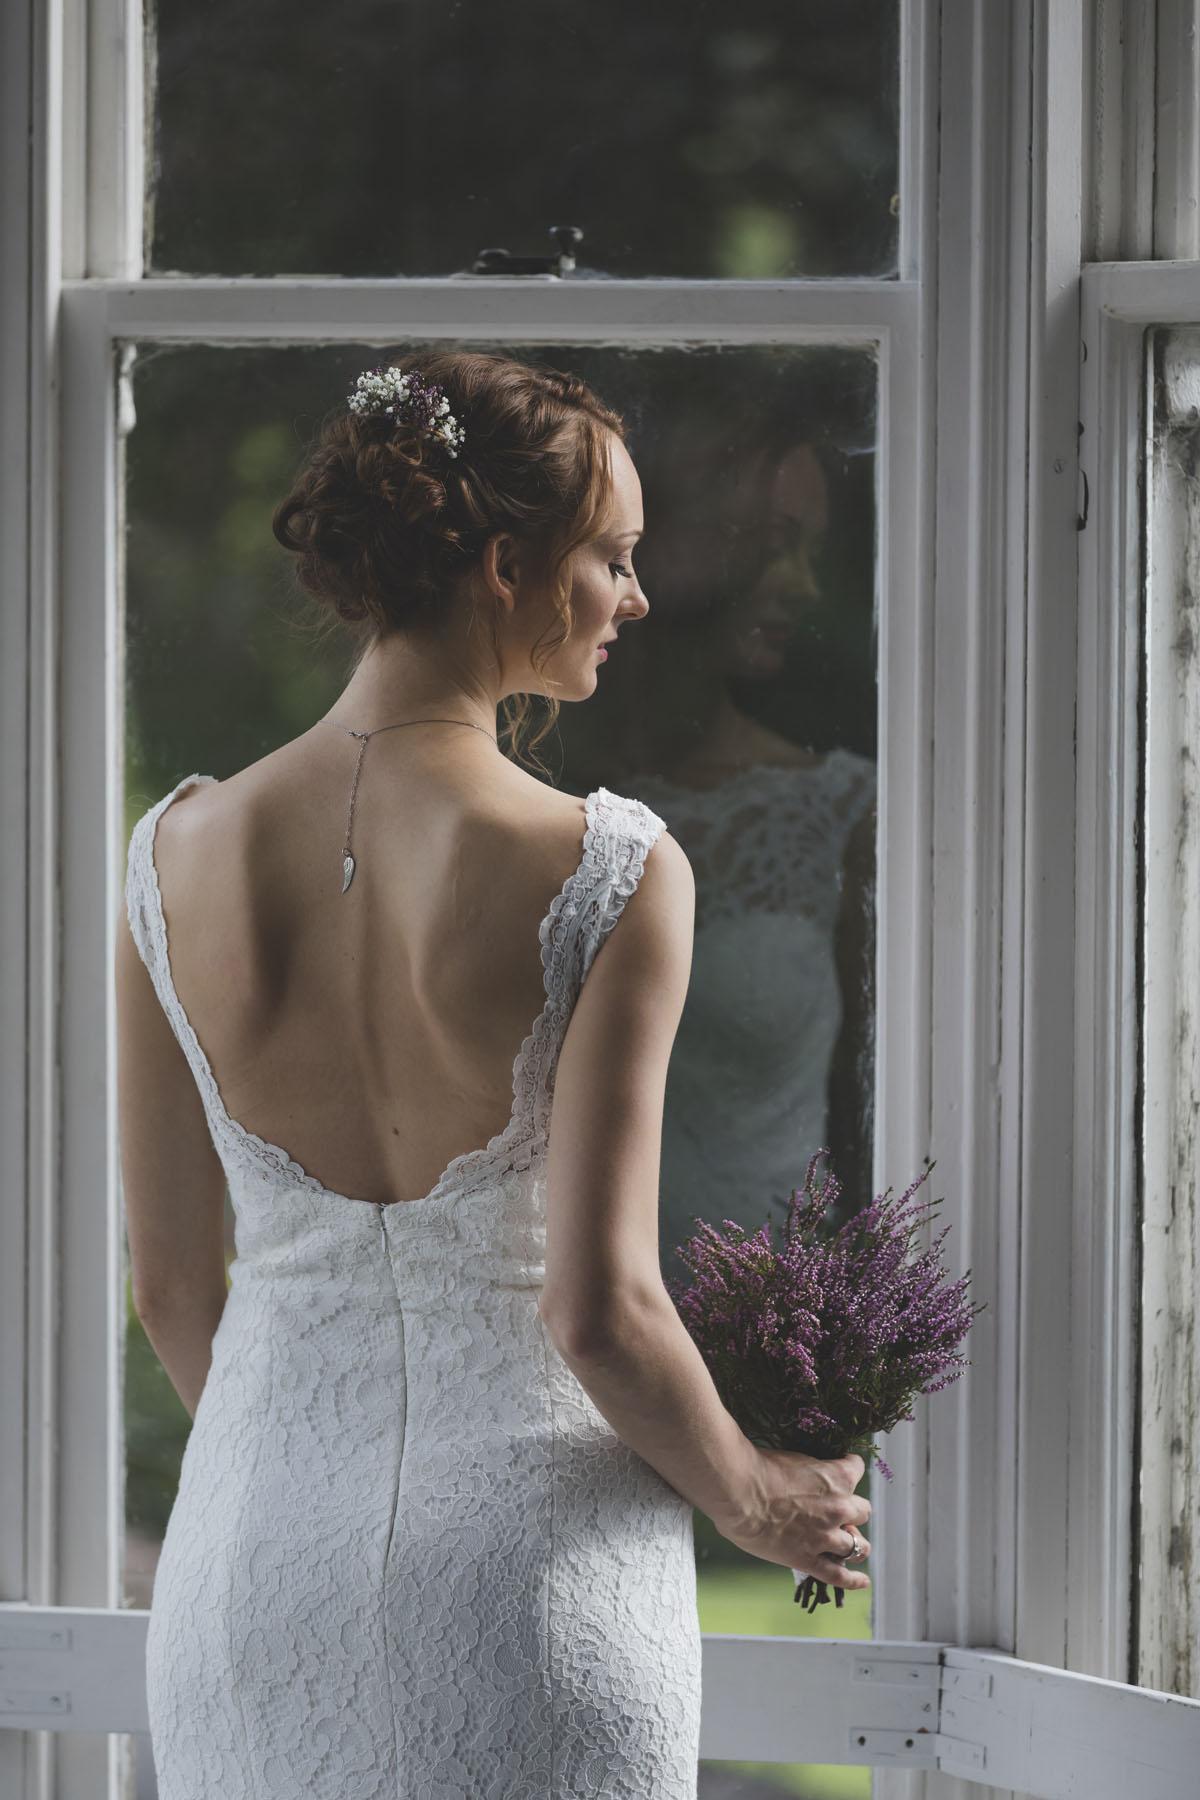 pulmafotod-044-scotland-wedding-photo.jpg